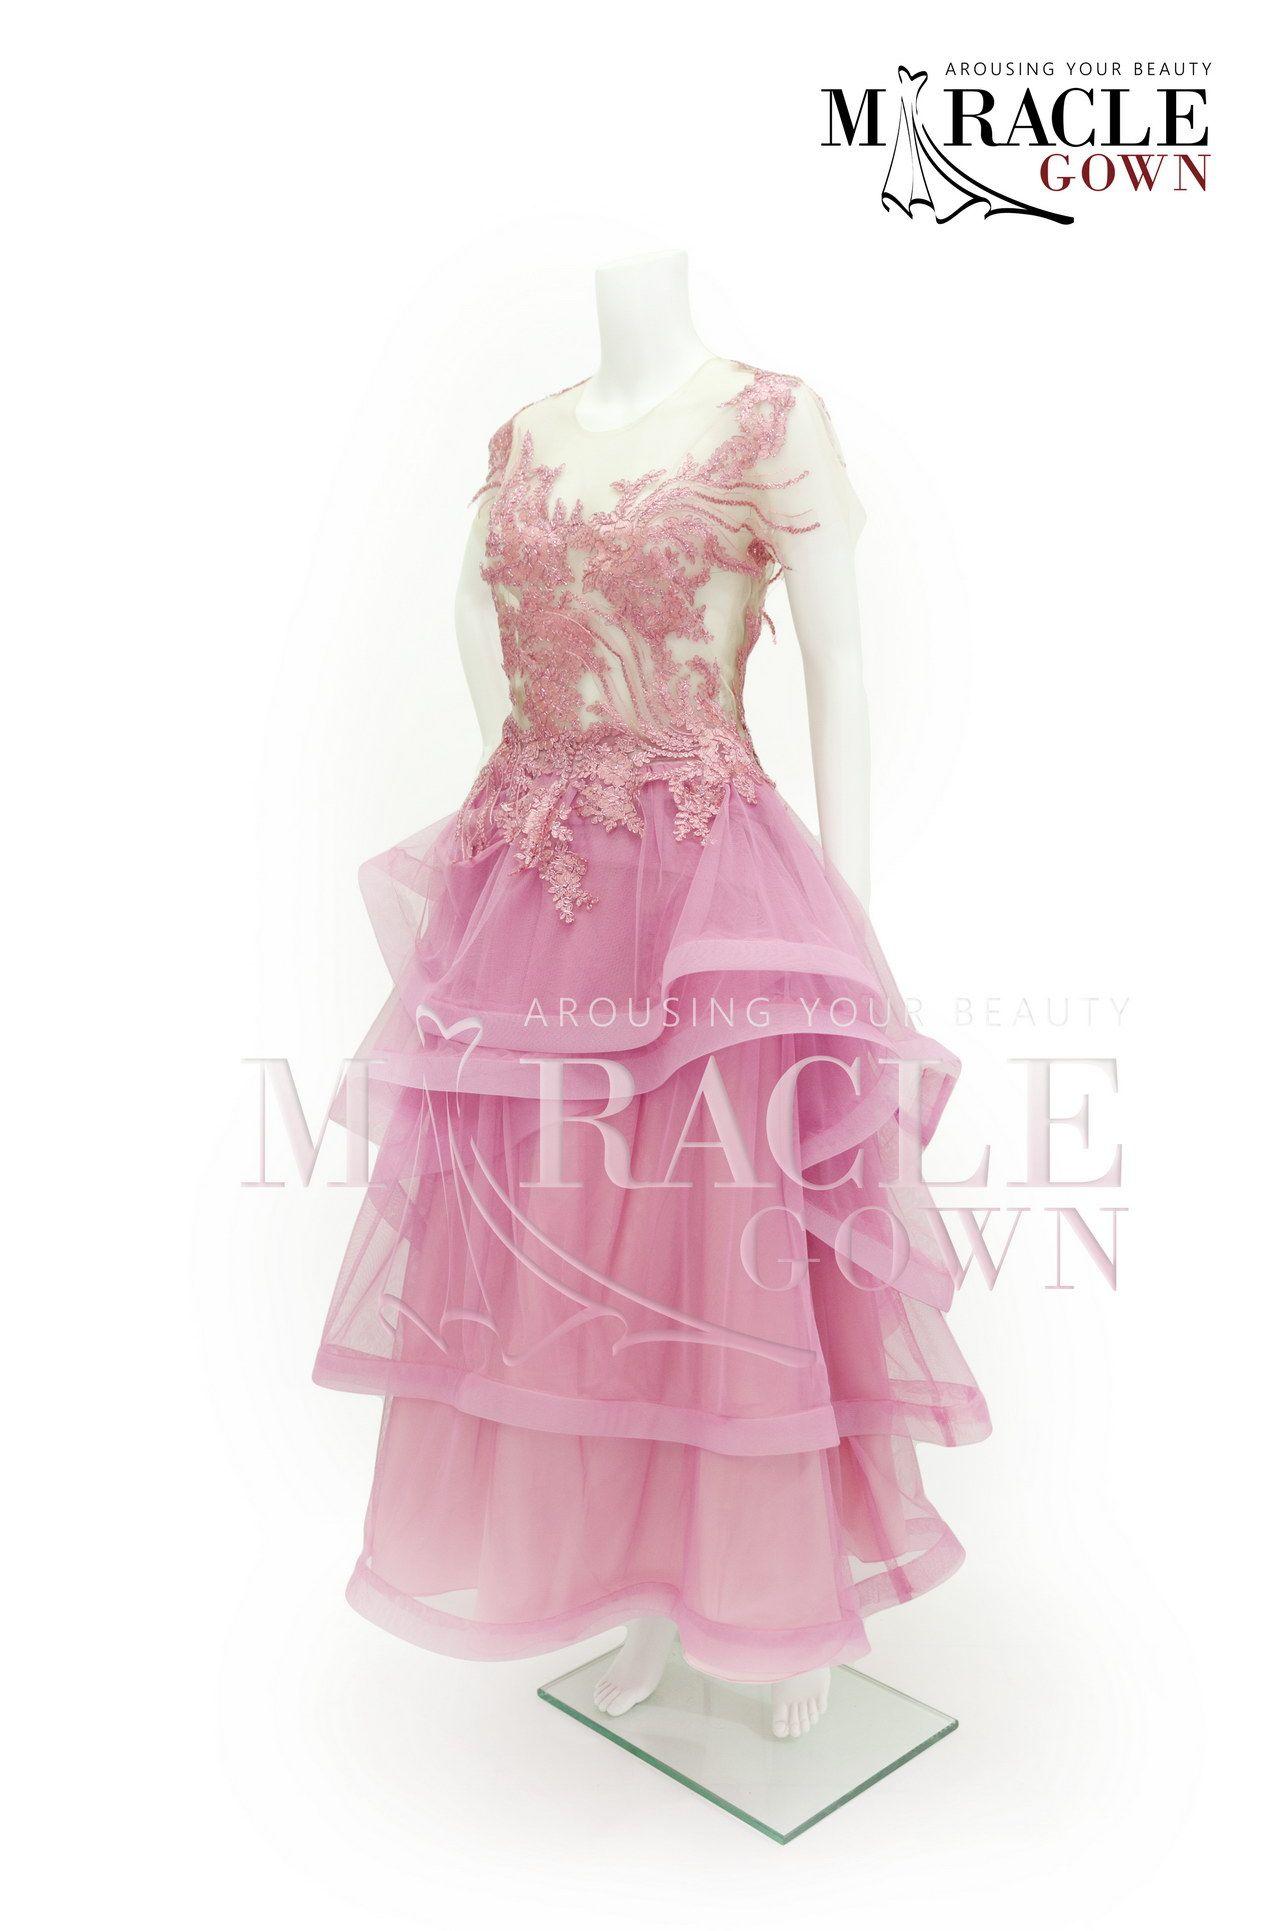 Miracle gown blushing pink brocade layered dress facebook